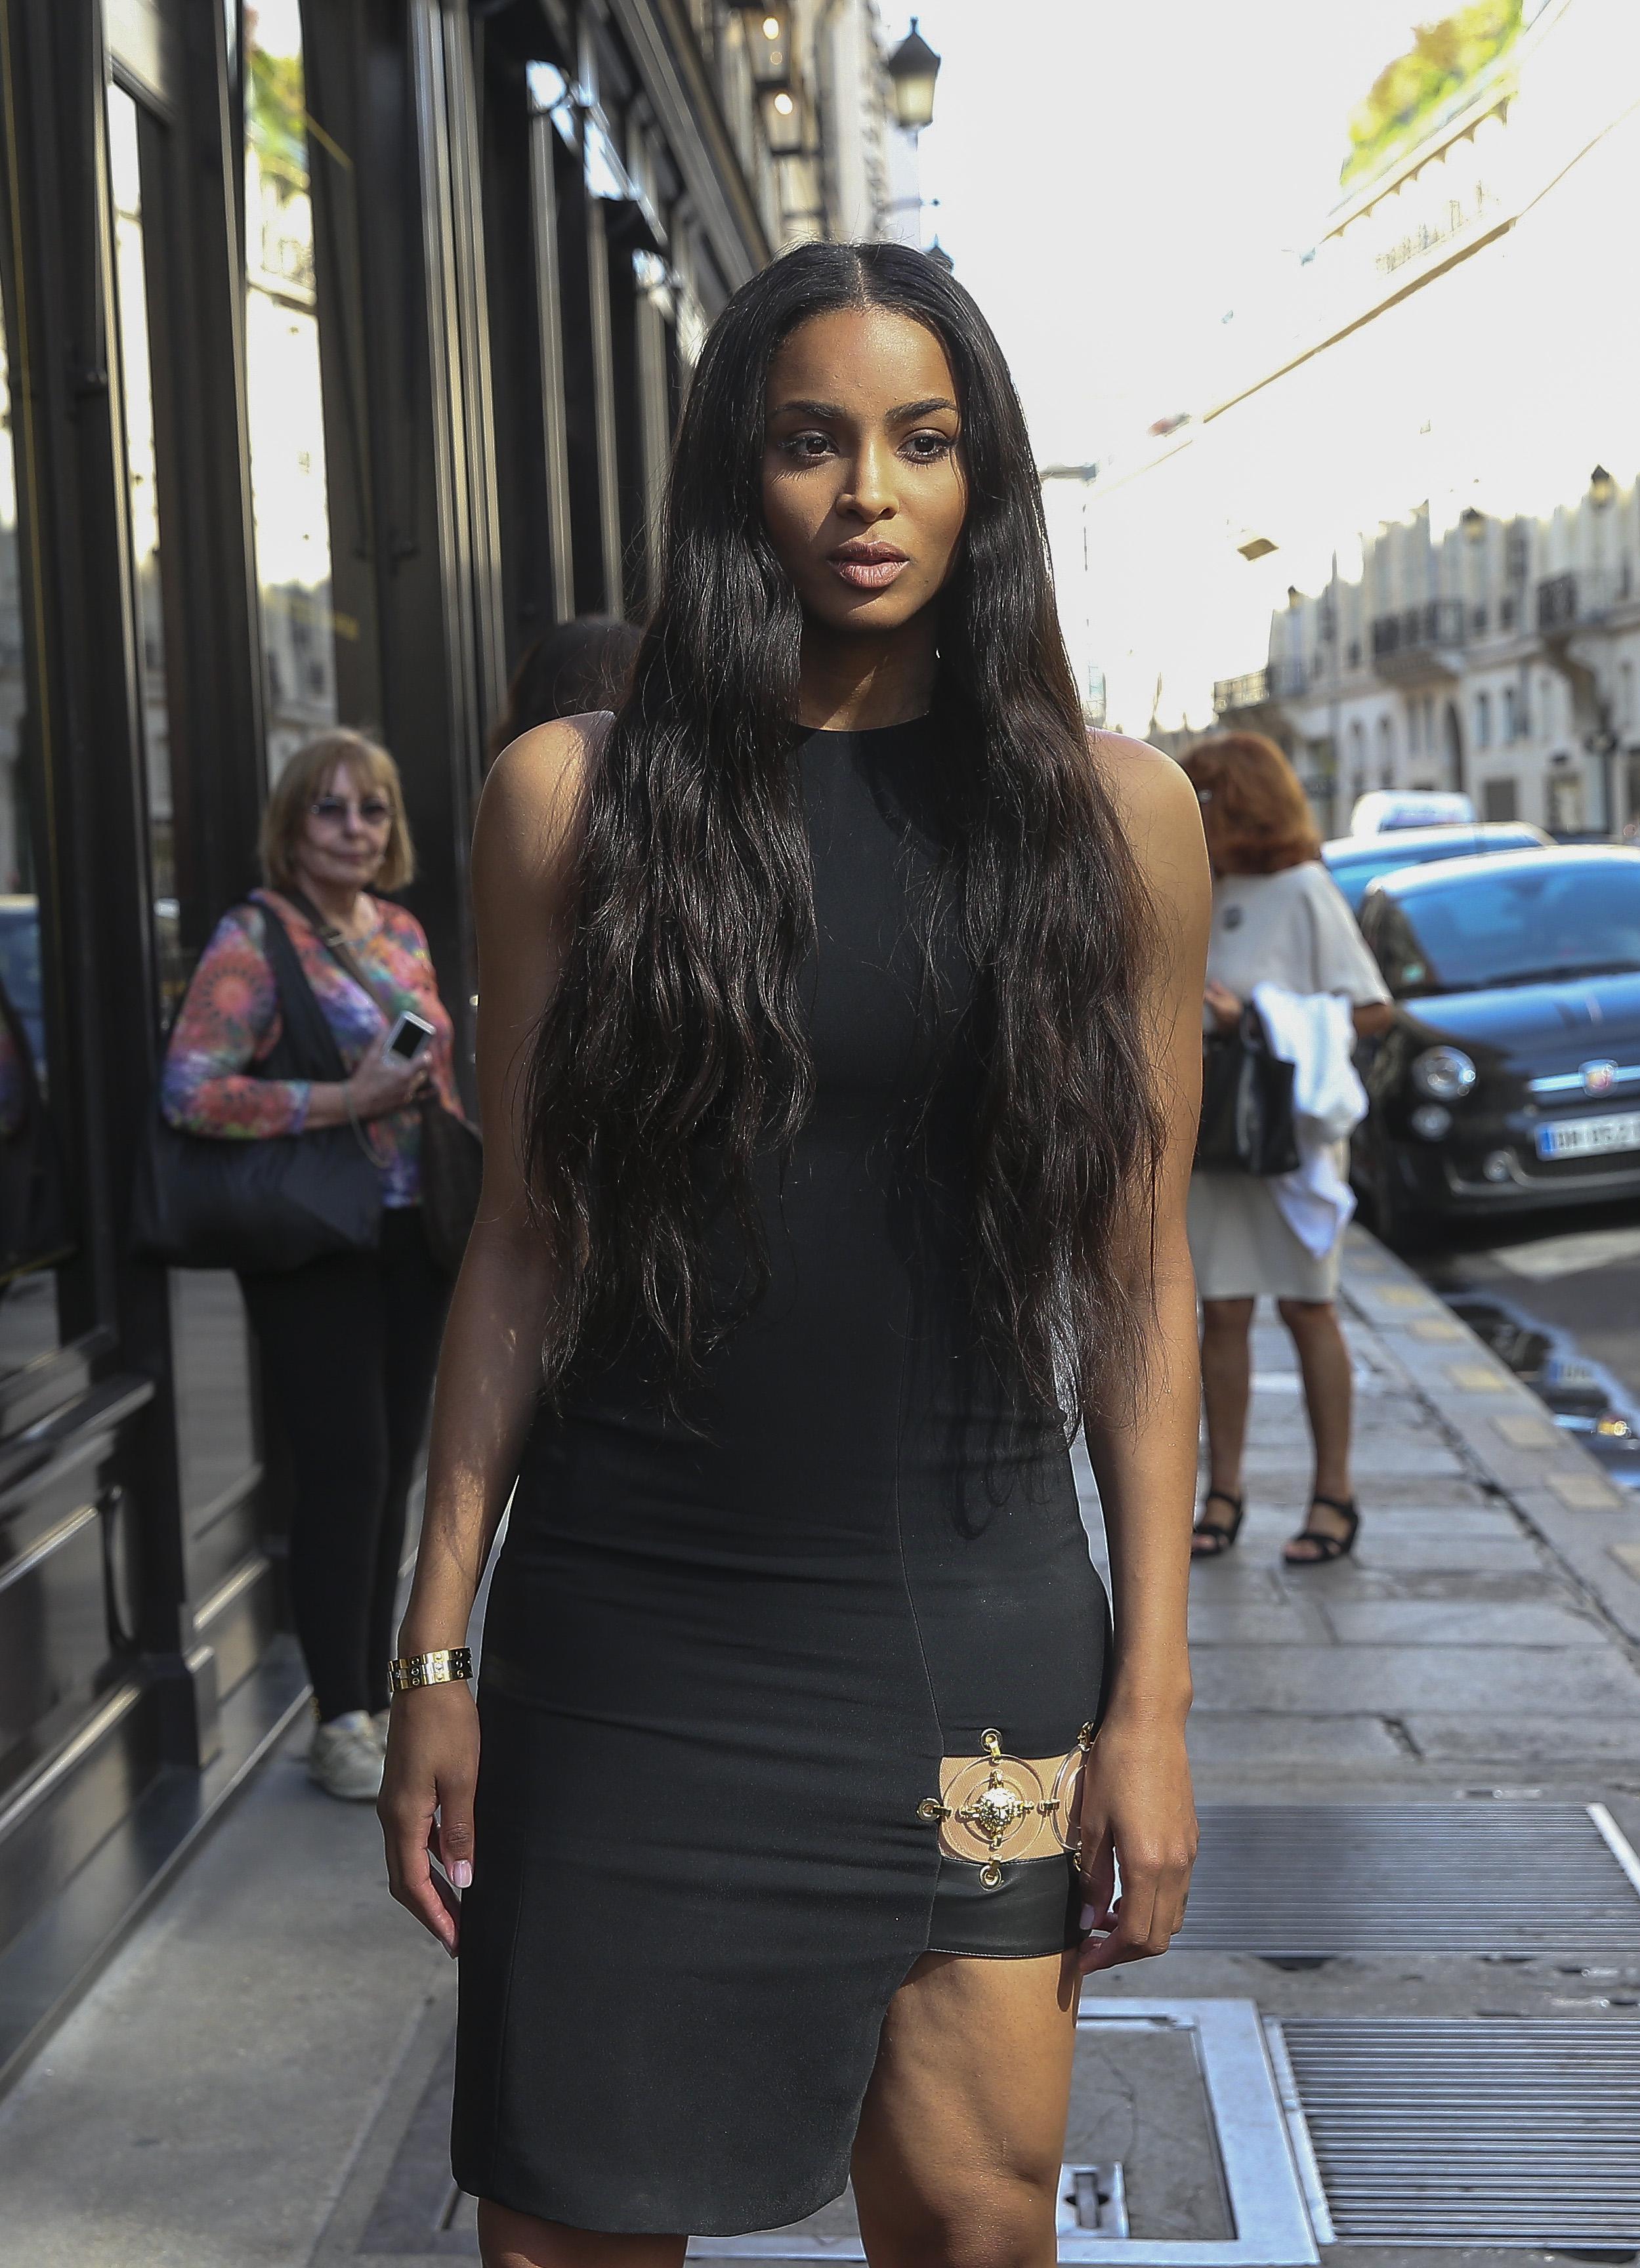 Ciara strolling rue Saint-Honore in Paris